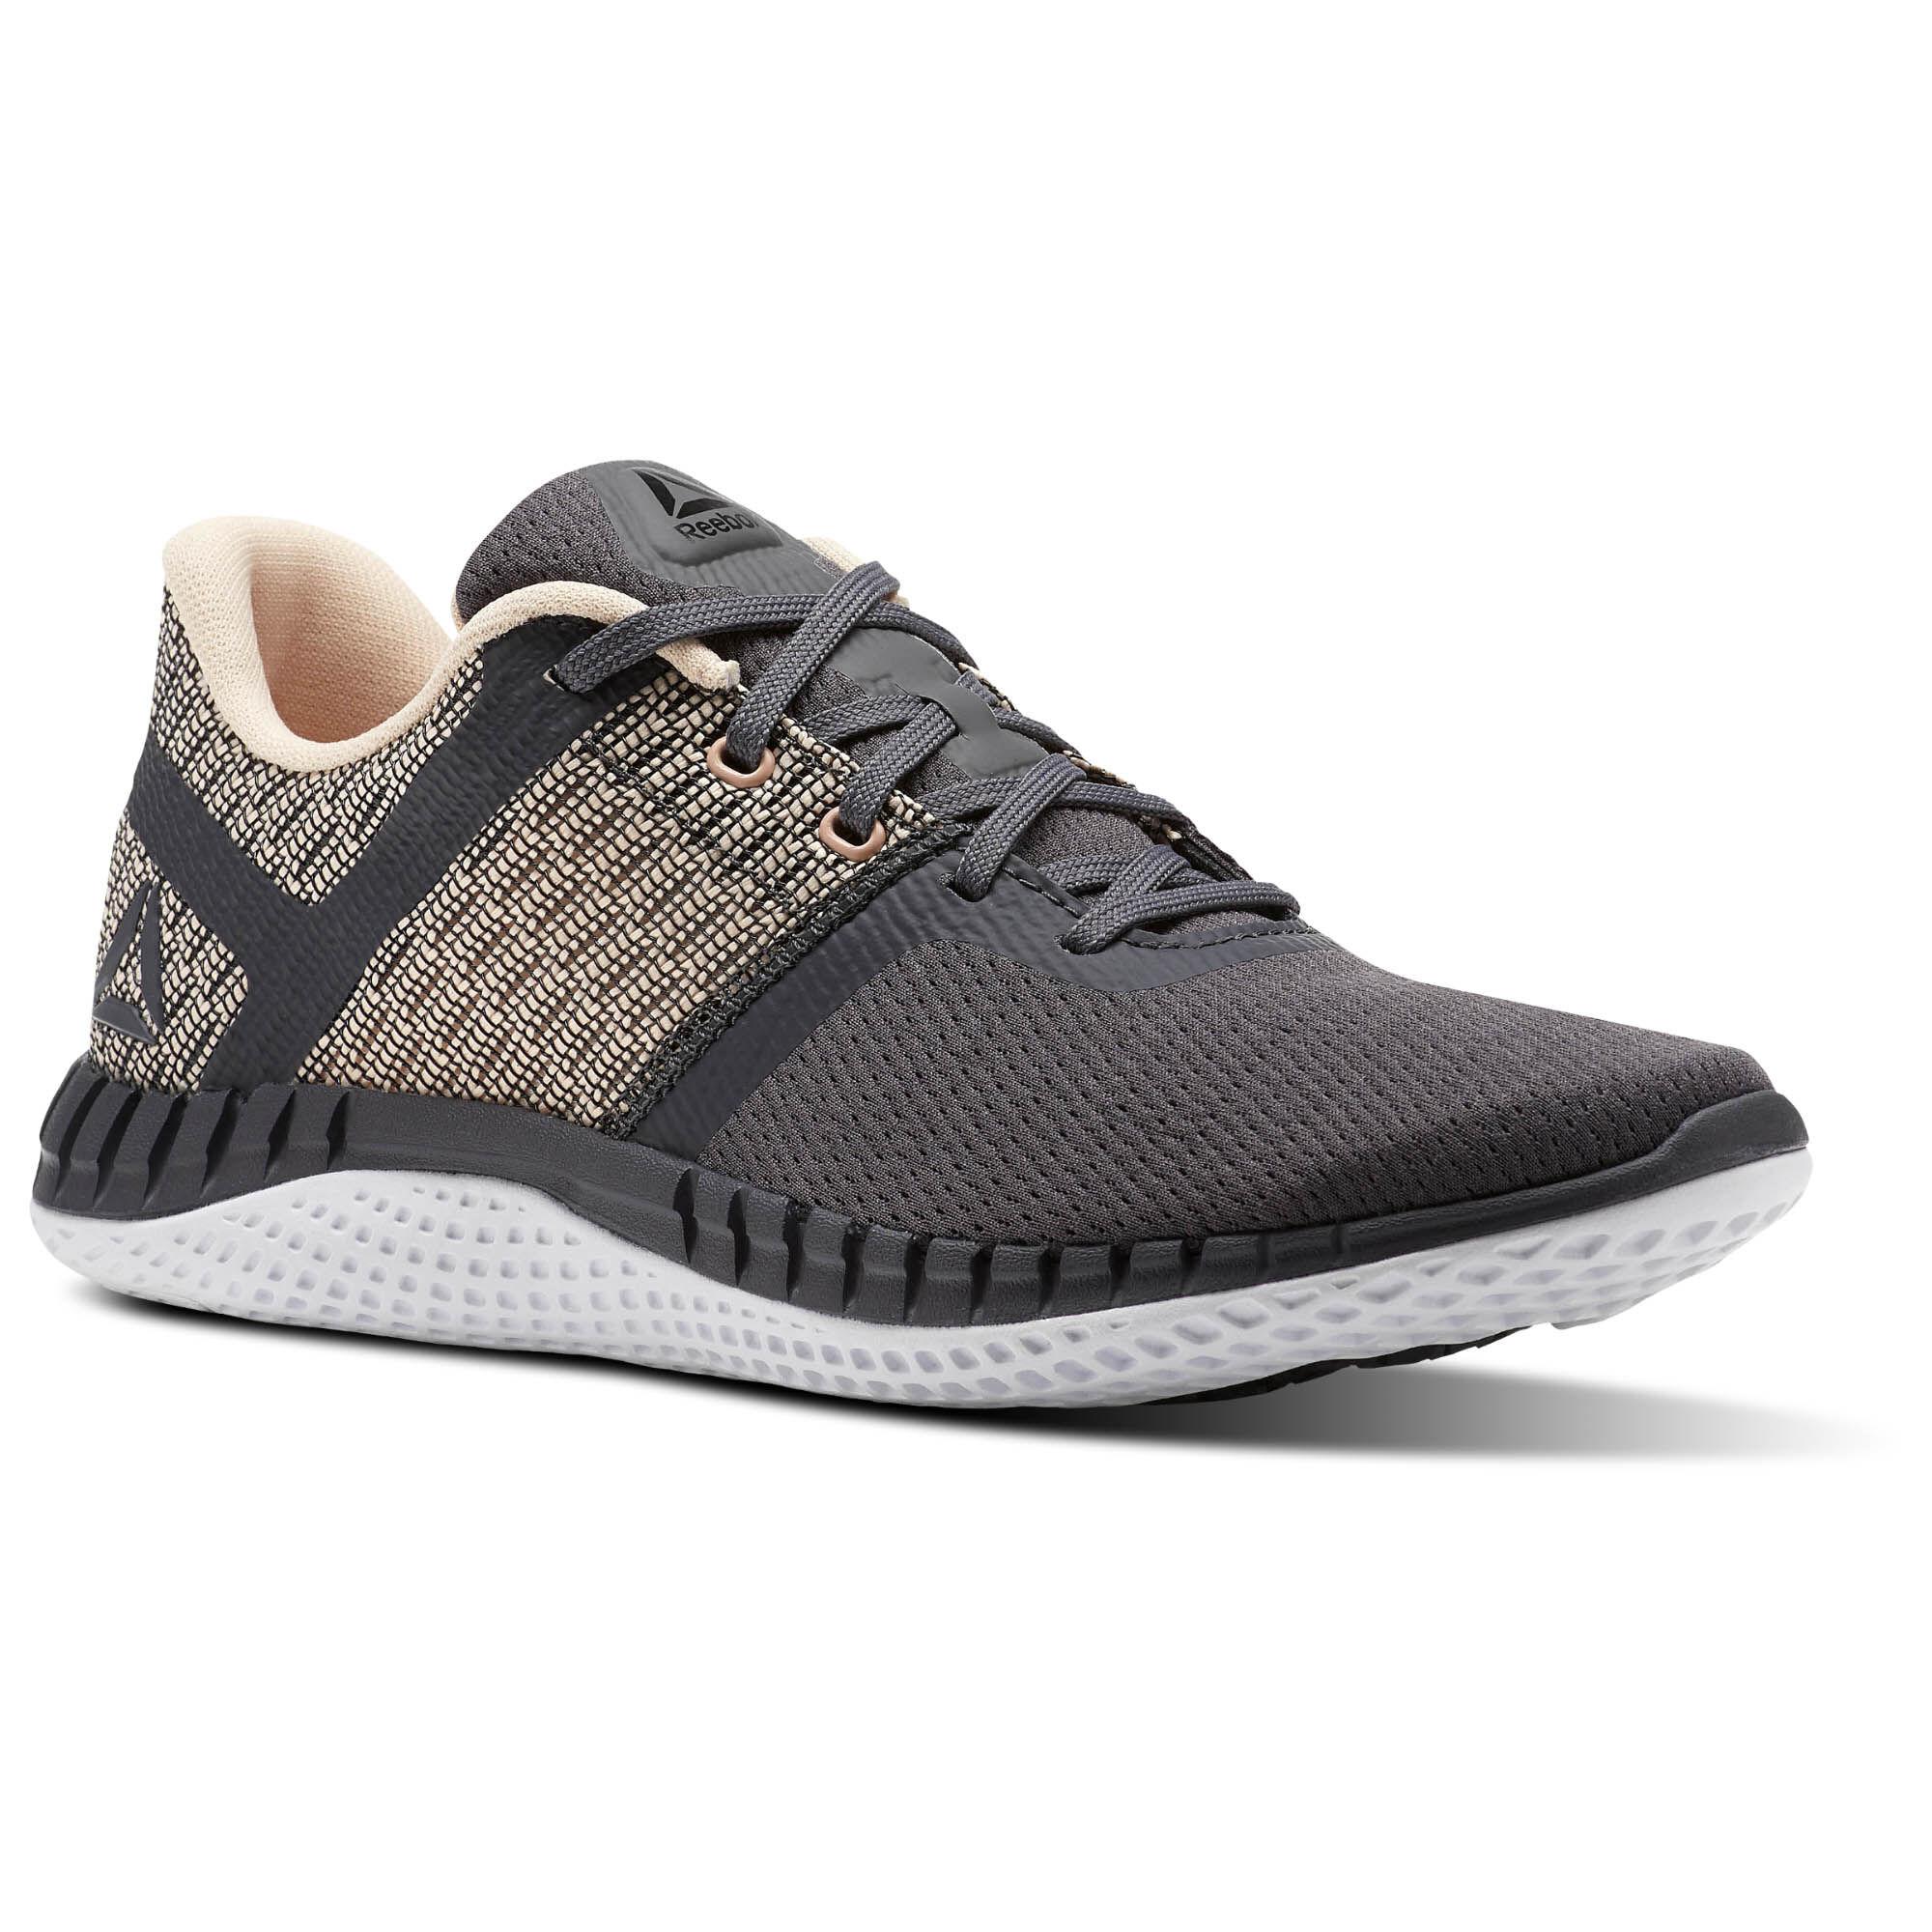 Schuhe Reebok - Print Run Next CN0428 Grey/Desert Dust/Pnk/Wht xOQDJj